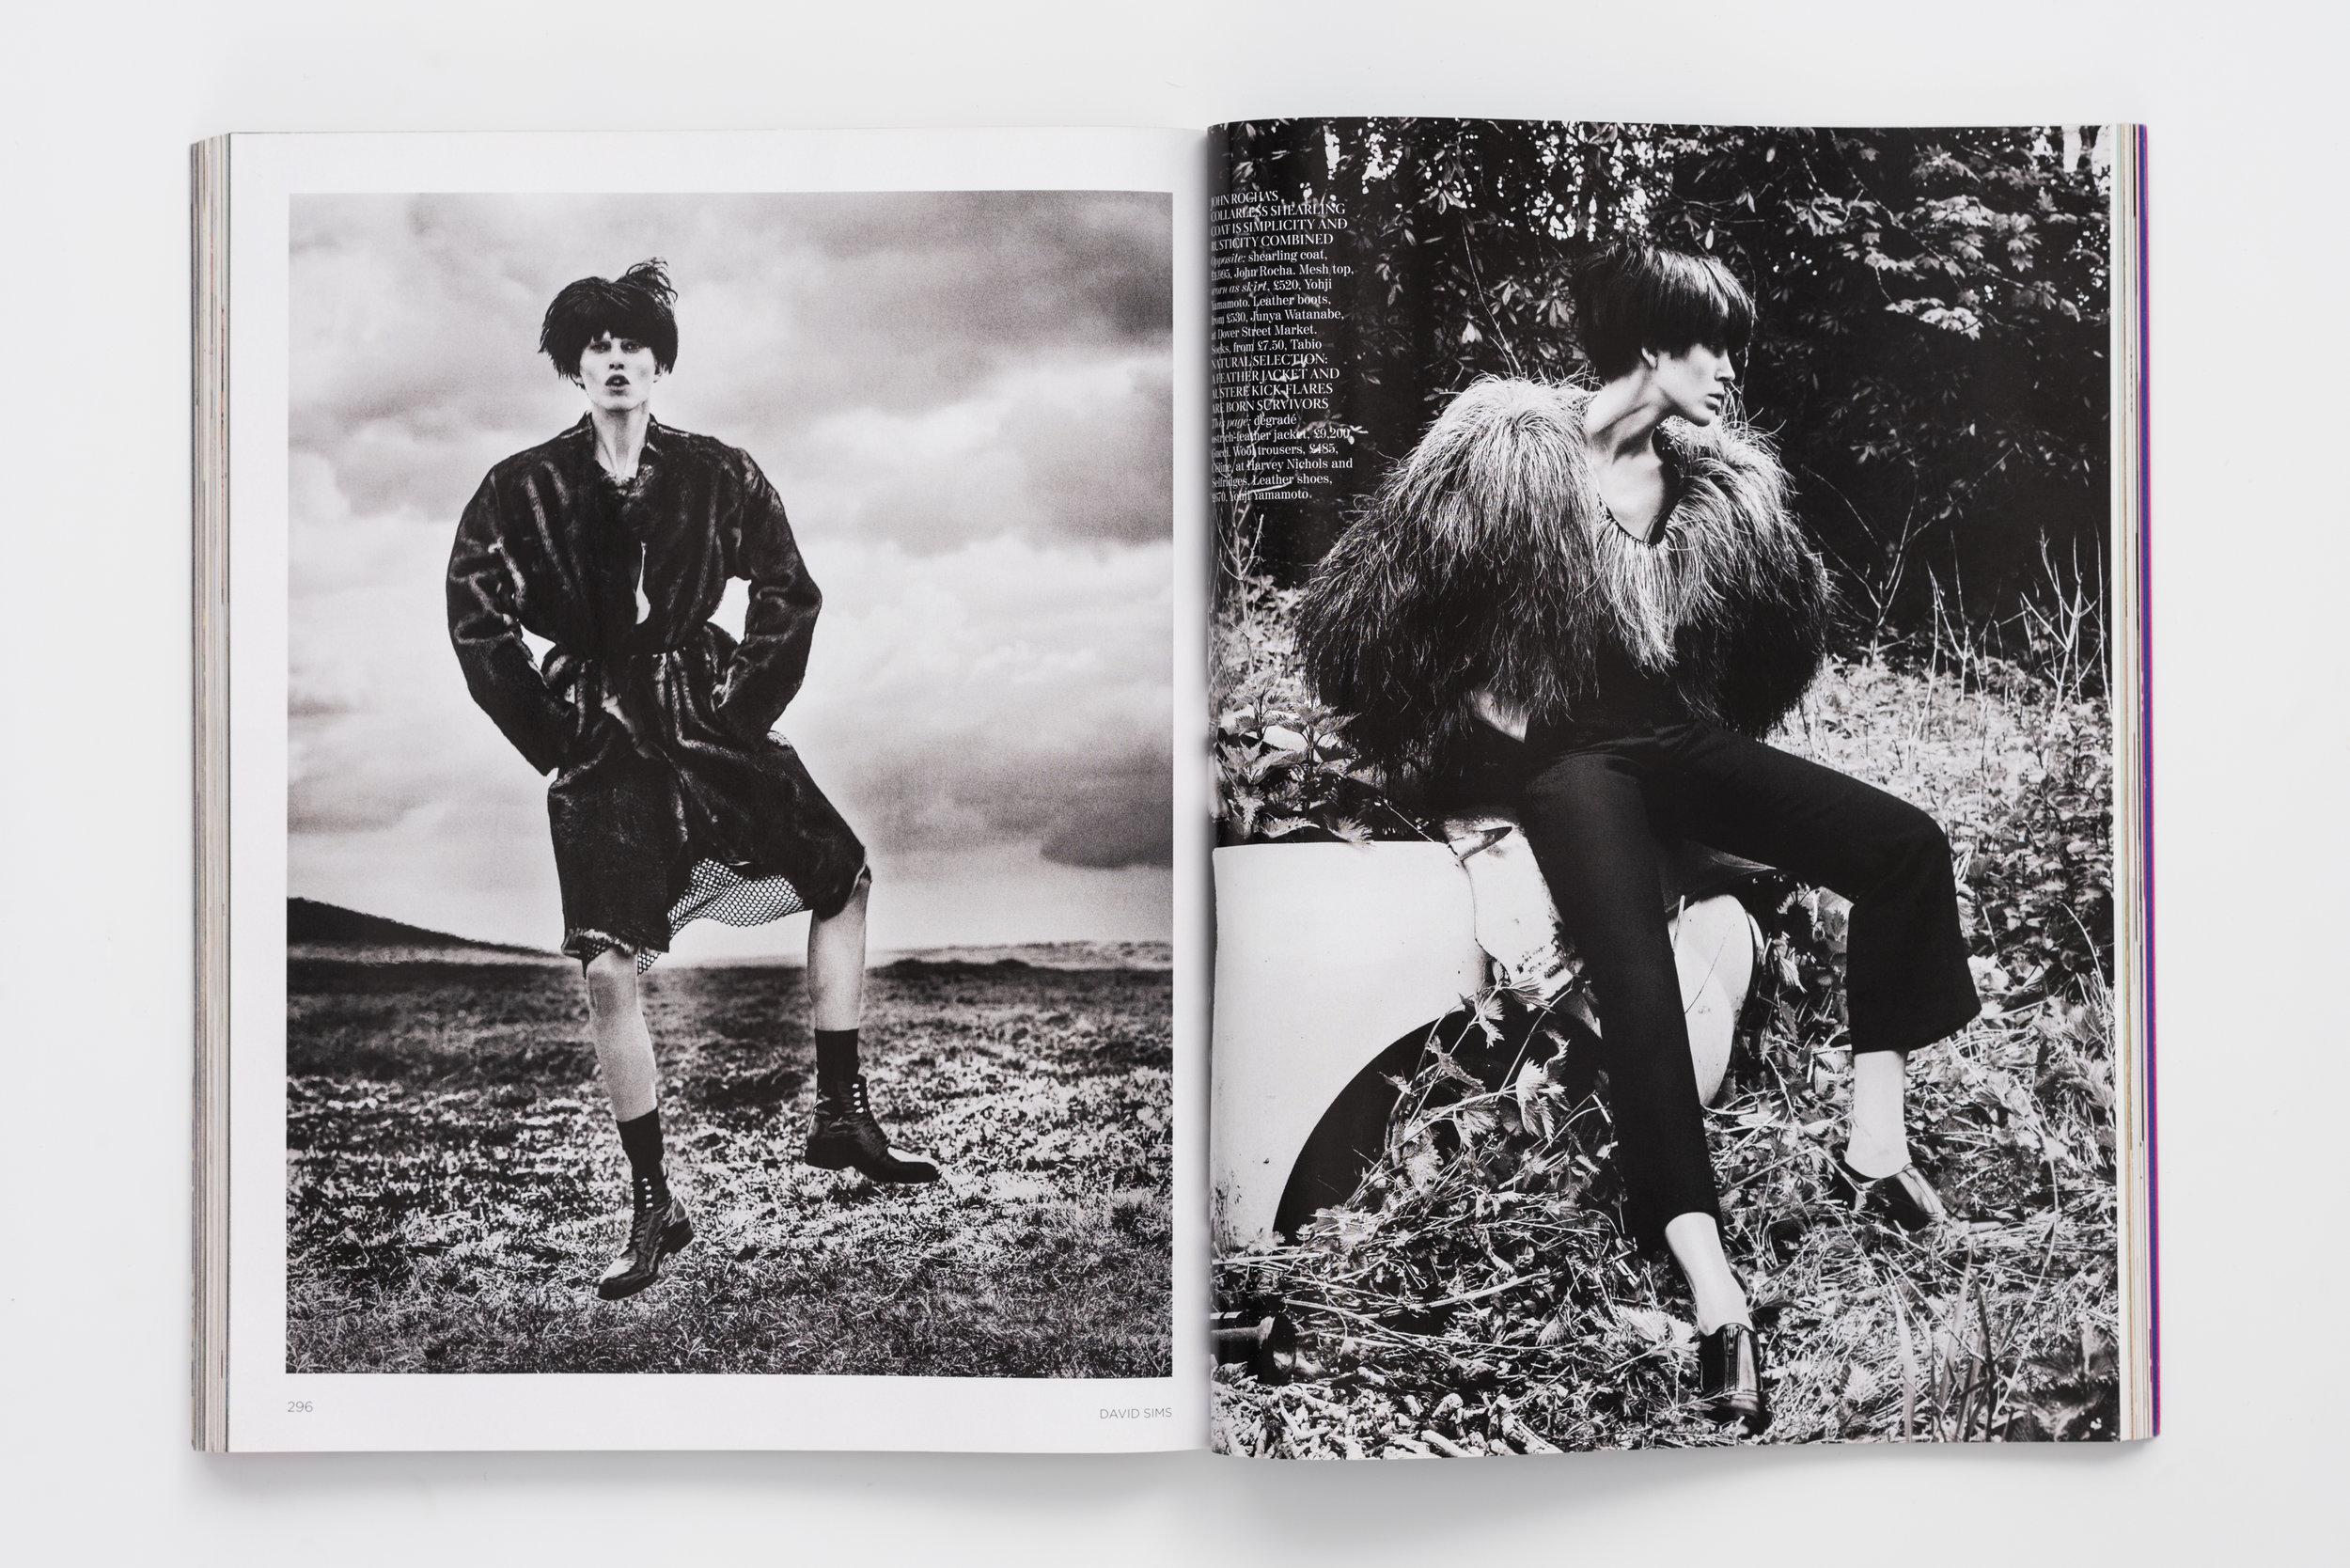 Iselin Steiro_David Sims_Quiet Storm_Vogue UK_3.jpg